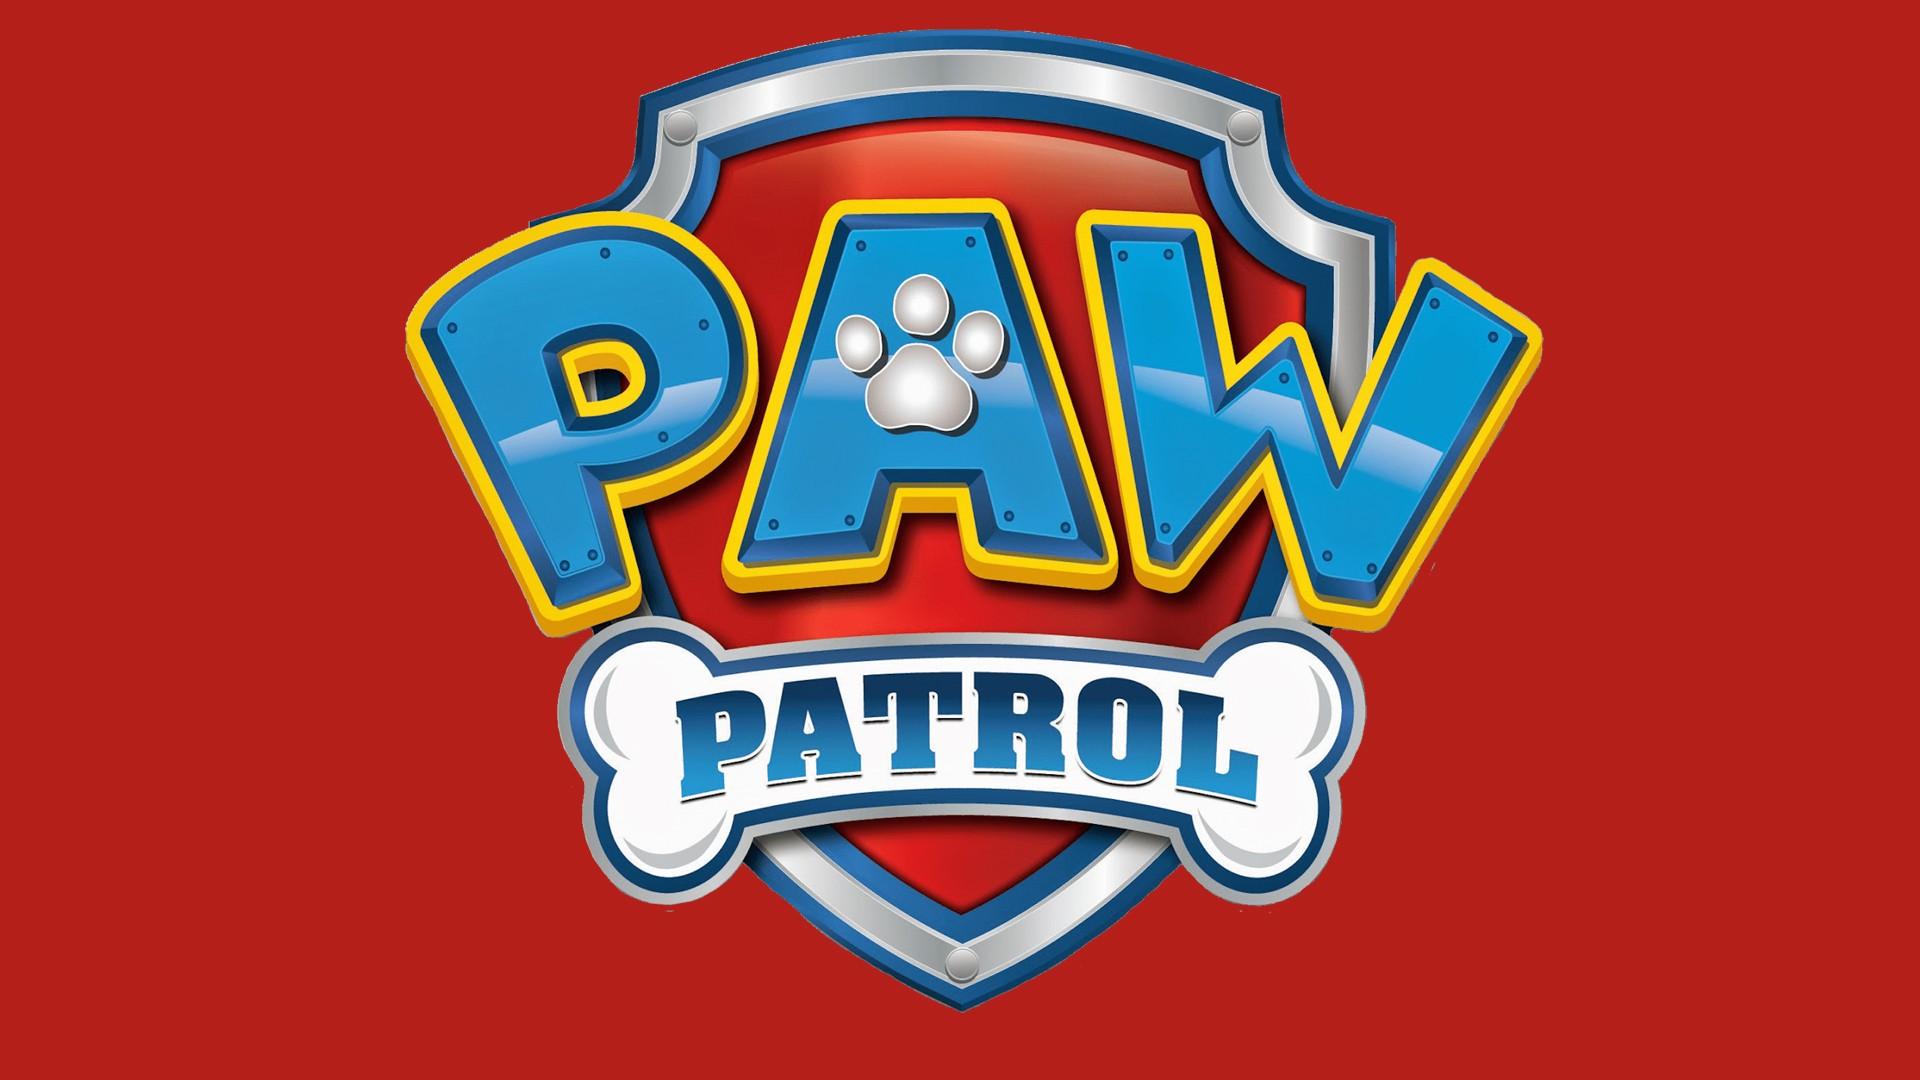 Paw Patrol Logo Vector at GetDrawings | Free download